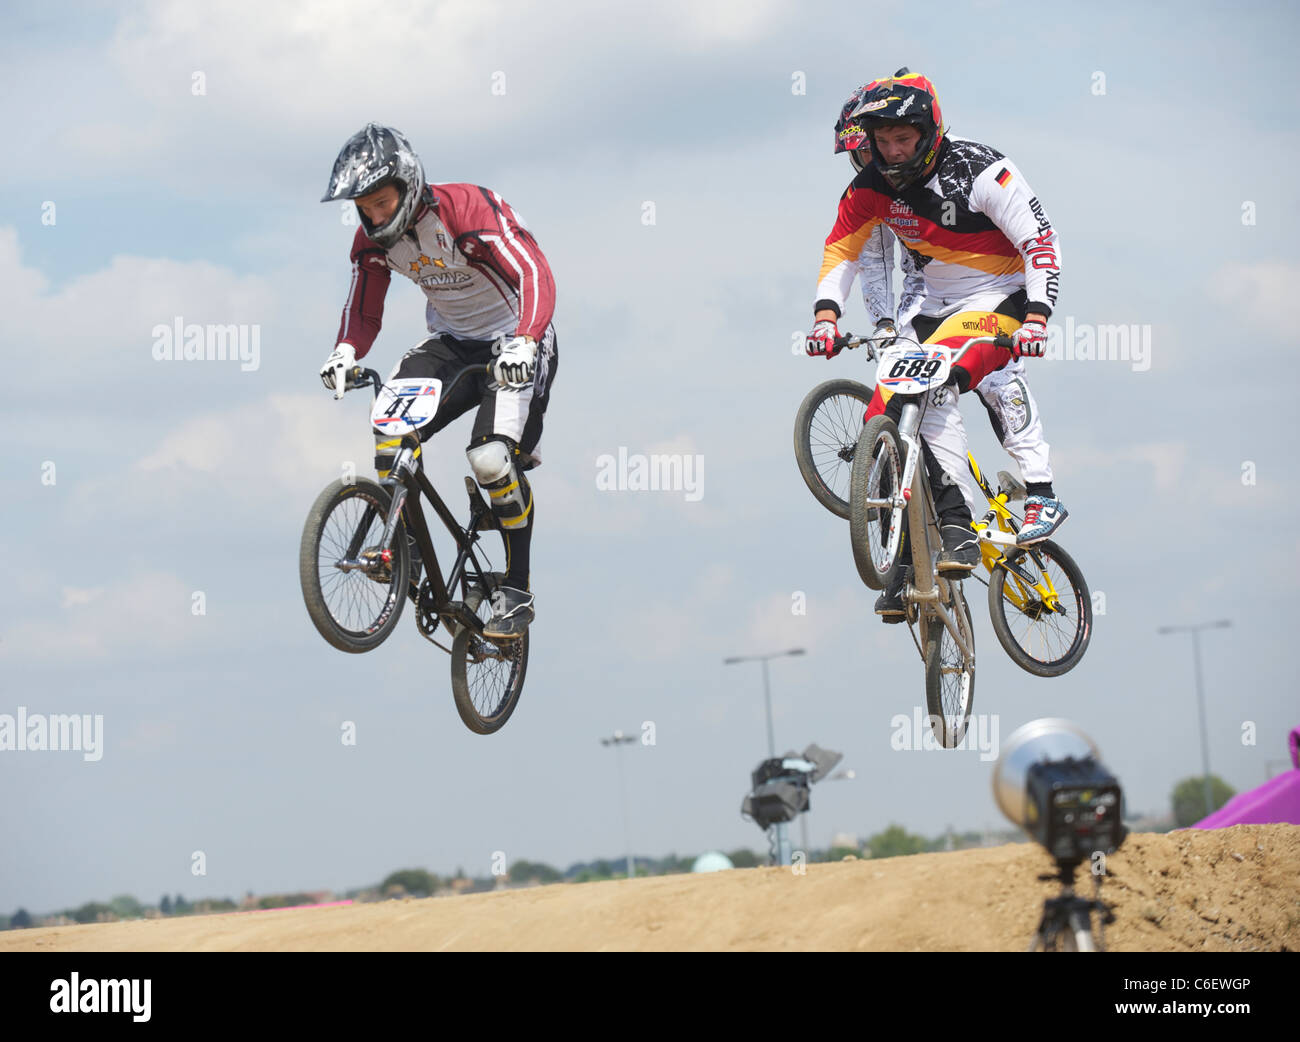 BMX Supercross World Cup Olympic Test Event Park Stratford London England